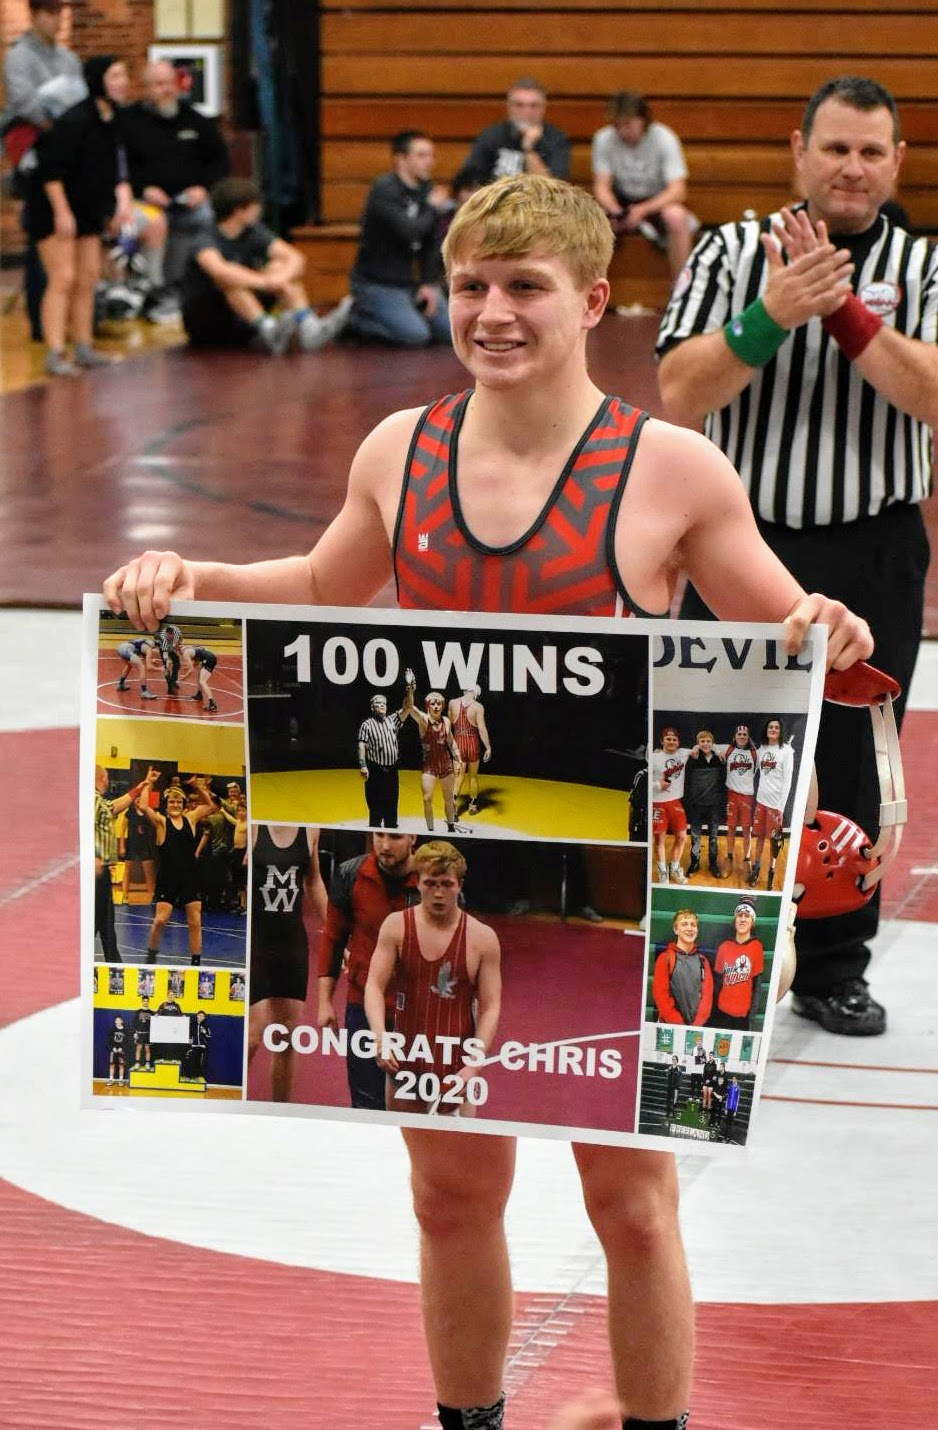 Chris Mills Captures 100th Career Win at Mayville Team Tournament – Konner Roche Gets Revenge Over High Ranked Opponent from Lakeville